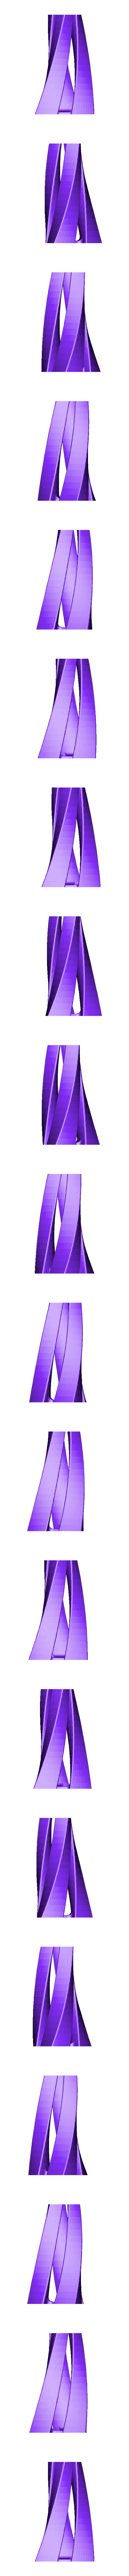 Tri-Oval_Vase.STL Download free STL file Tri-oval vase • 3D print design, BEEVERYCREATIVE